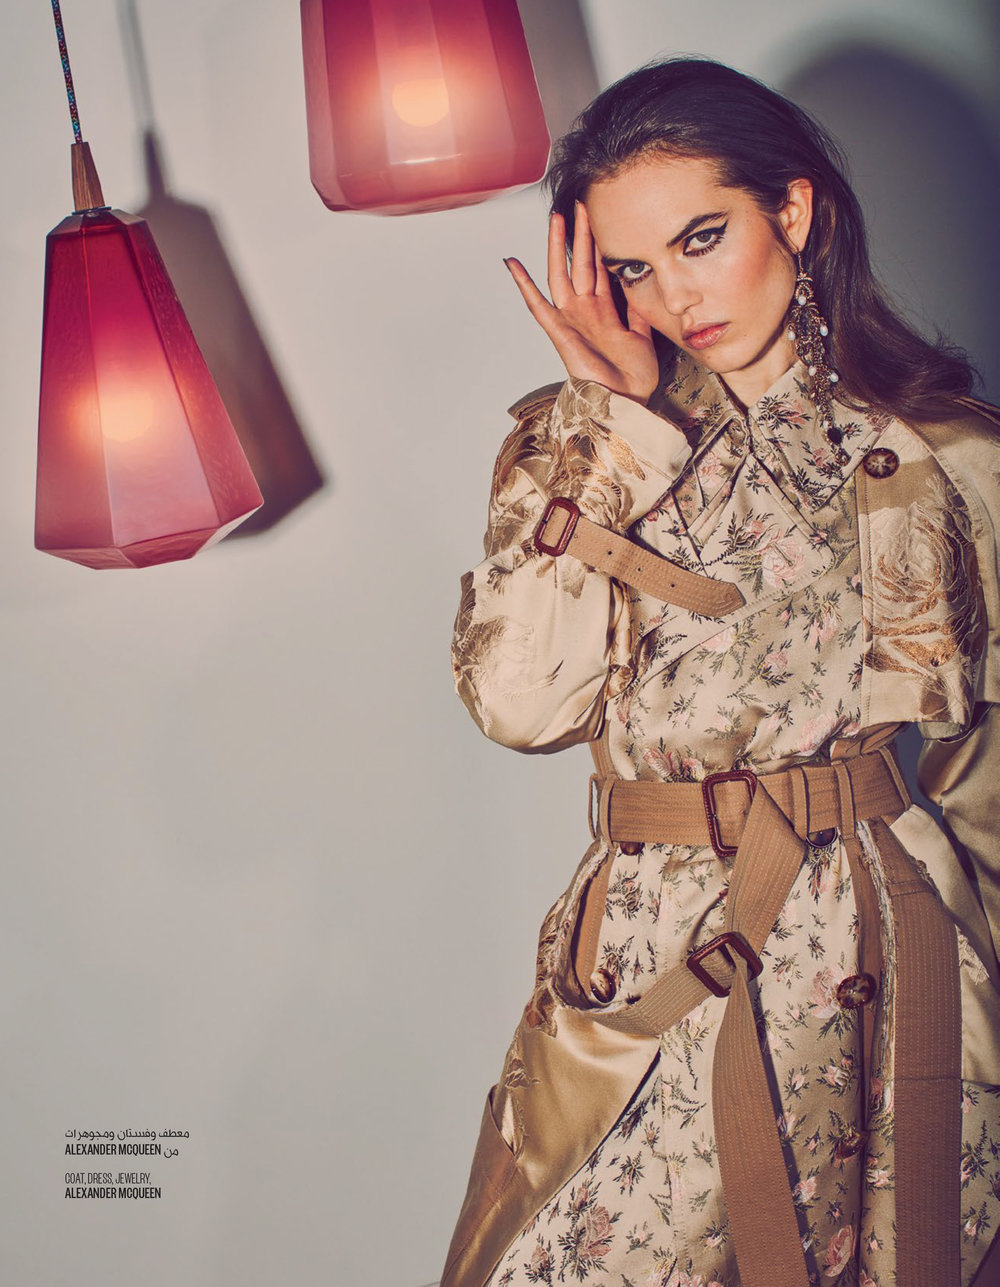 Vogue Arabia March 18 Final Binder_Magzter (dragged) 3-3.jpg